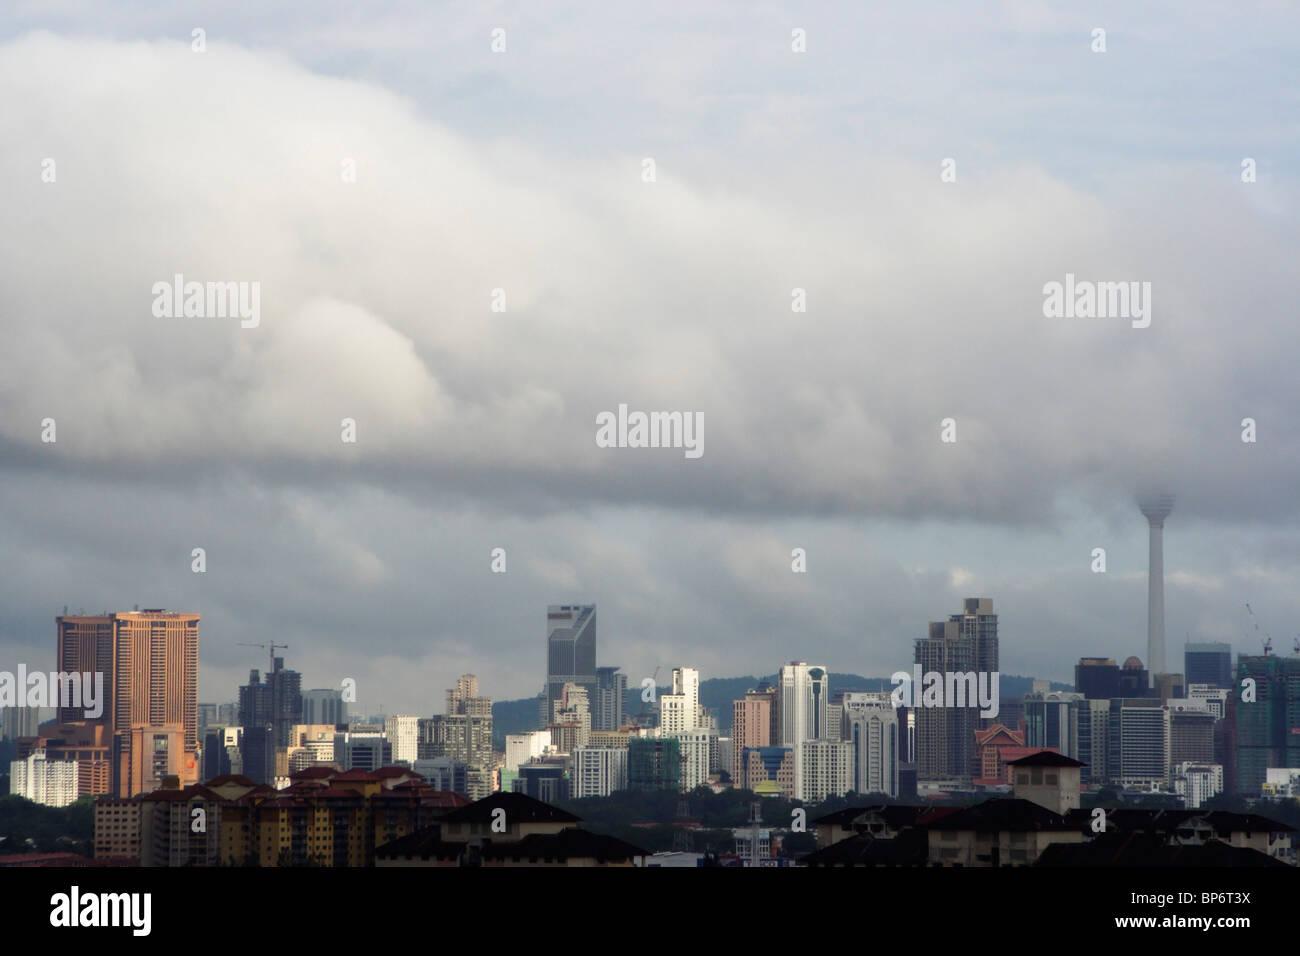 Kuala Lumpur, Malaisie, sous faible nuage noir. Photo Stock